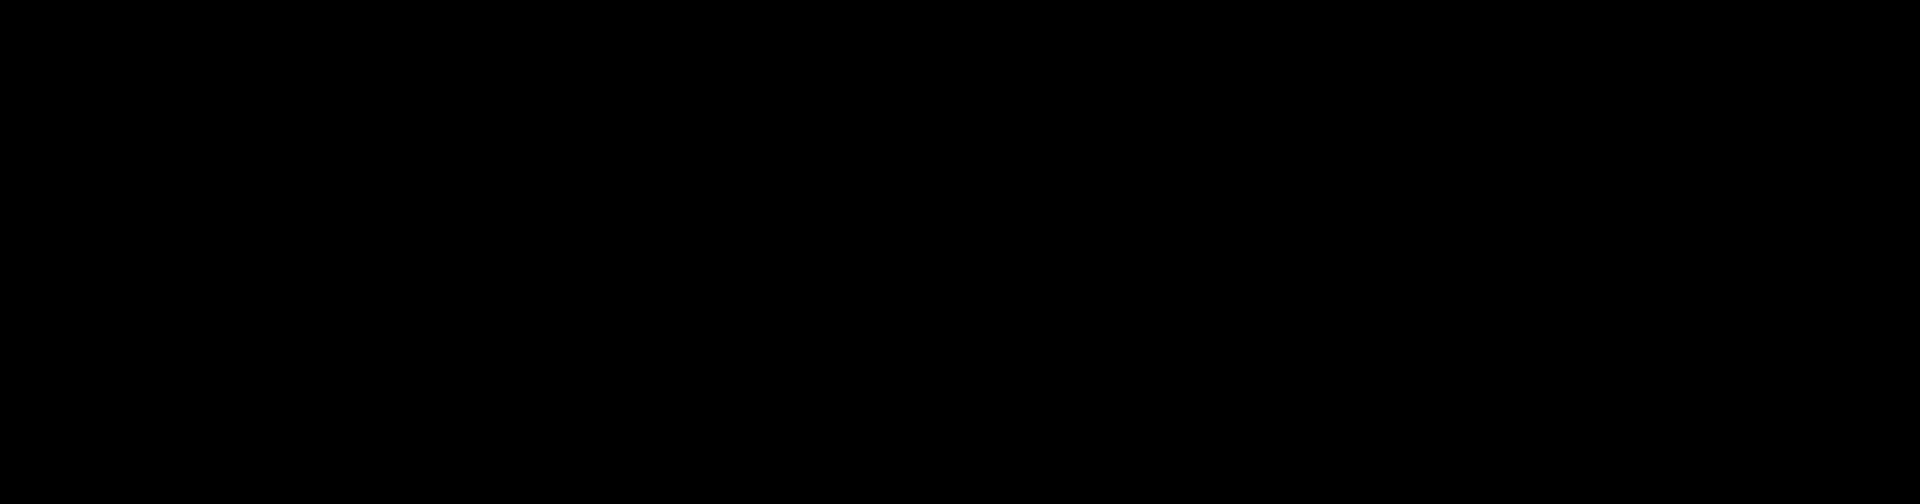 Key Difference - 1 Propanol vs 2 Propanol